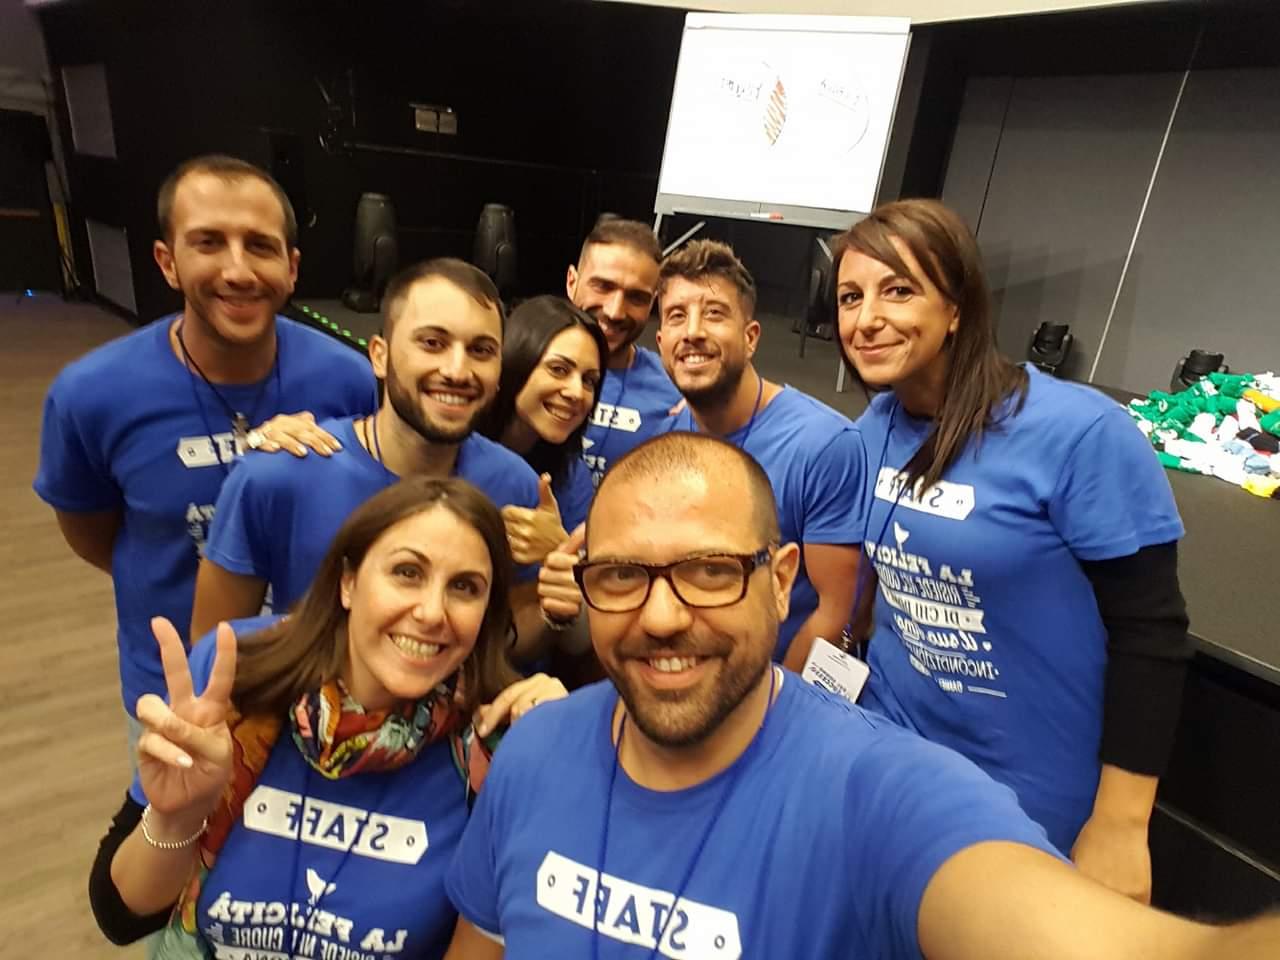 Duolife_2019_corrado_cavarra_networker_sicilia_italia6